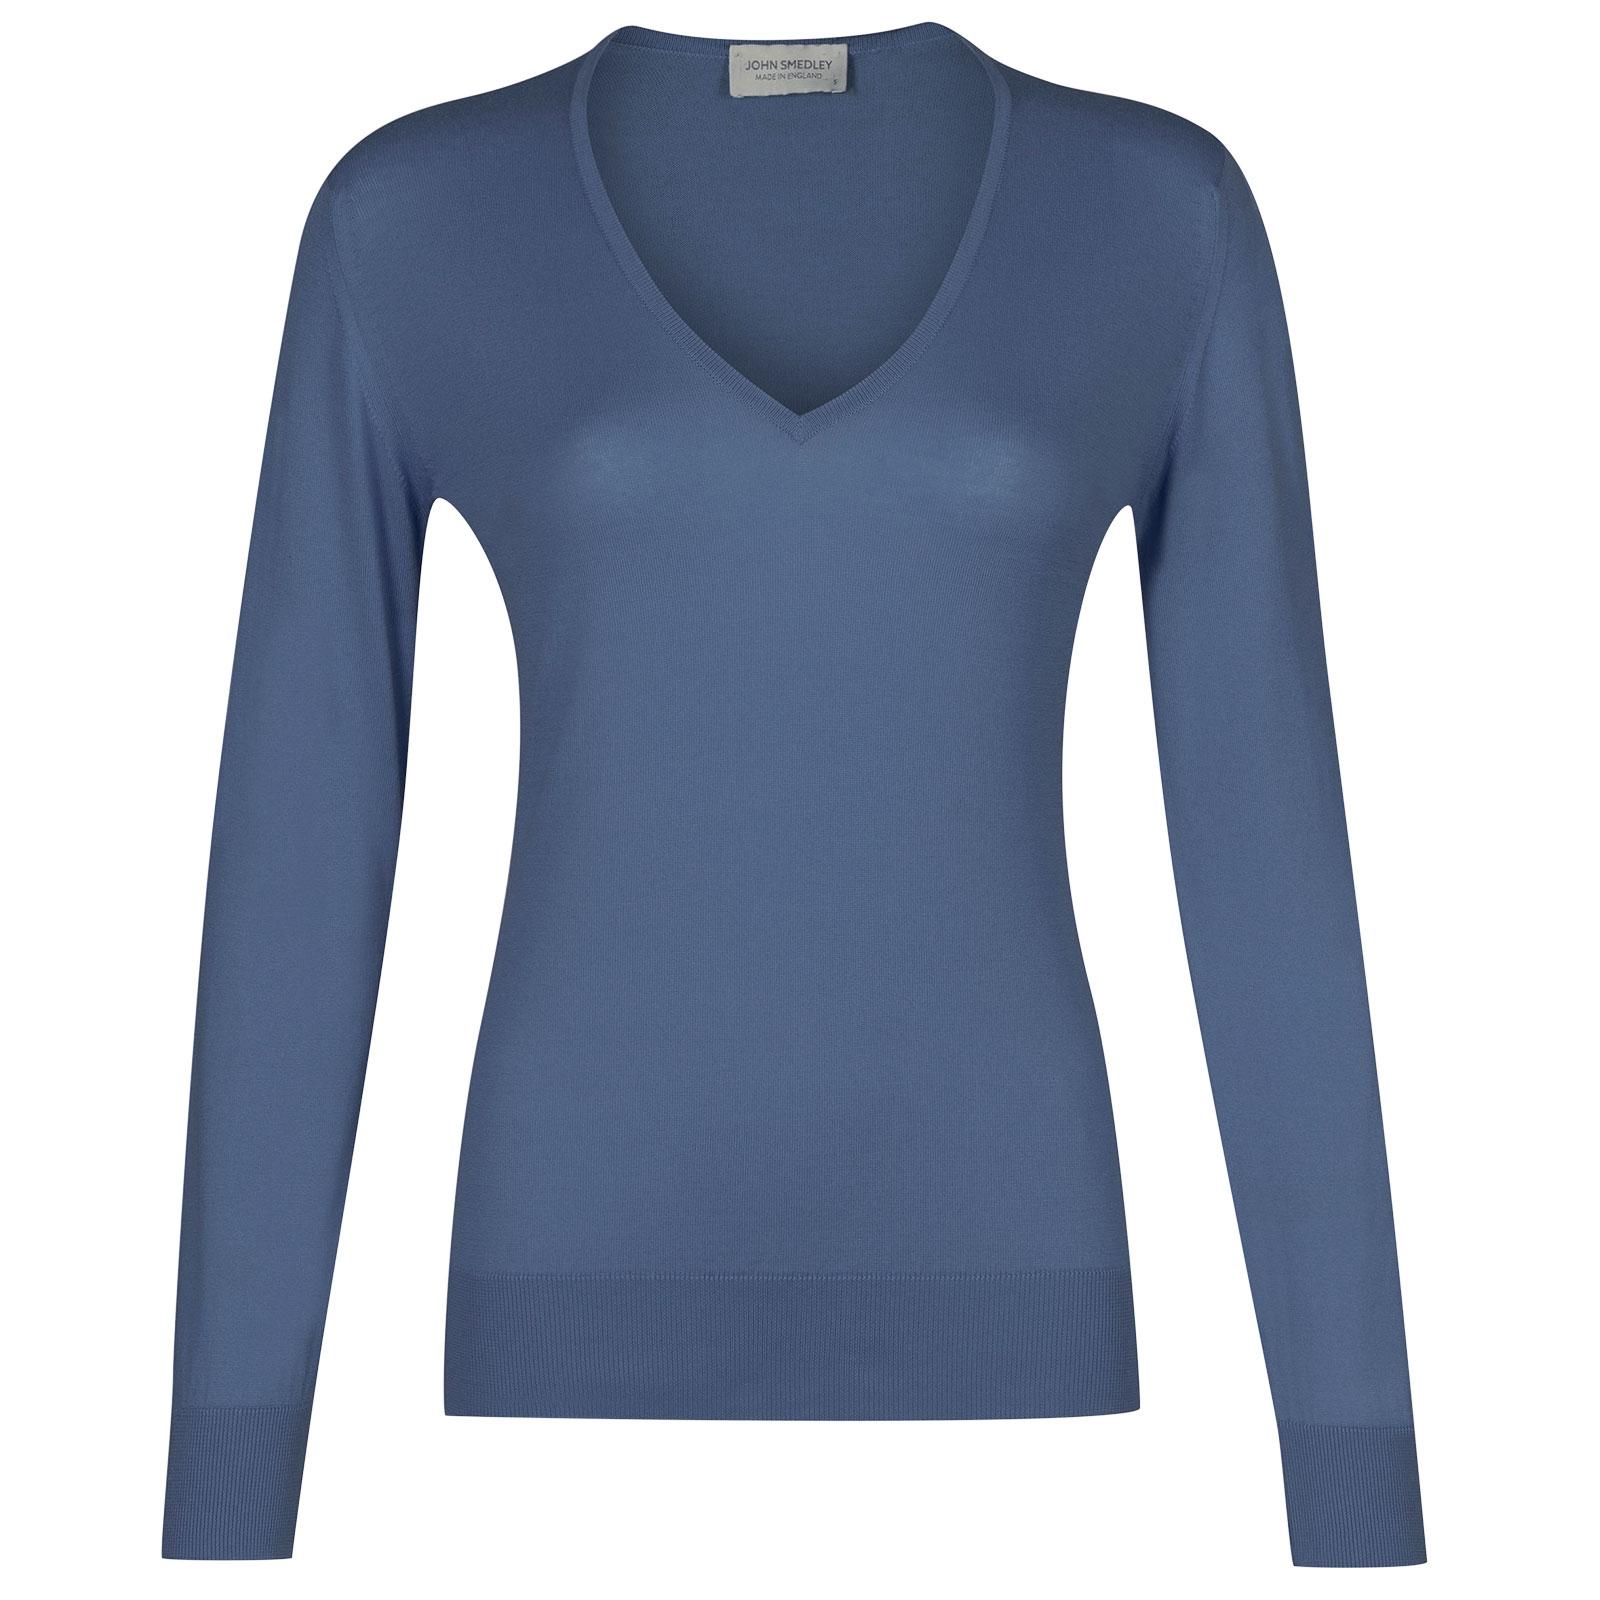 John Smedley Putney in Blue Iris Sweater-LGE